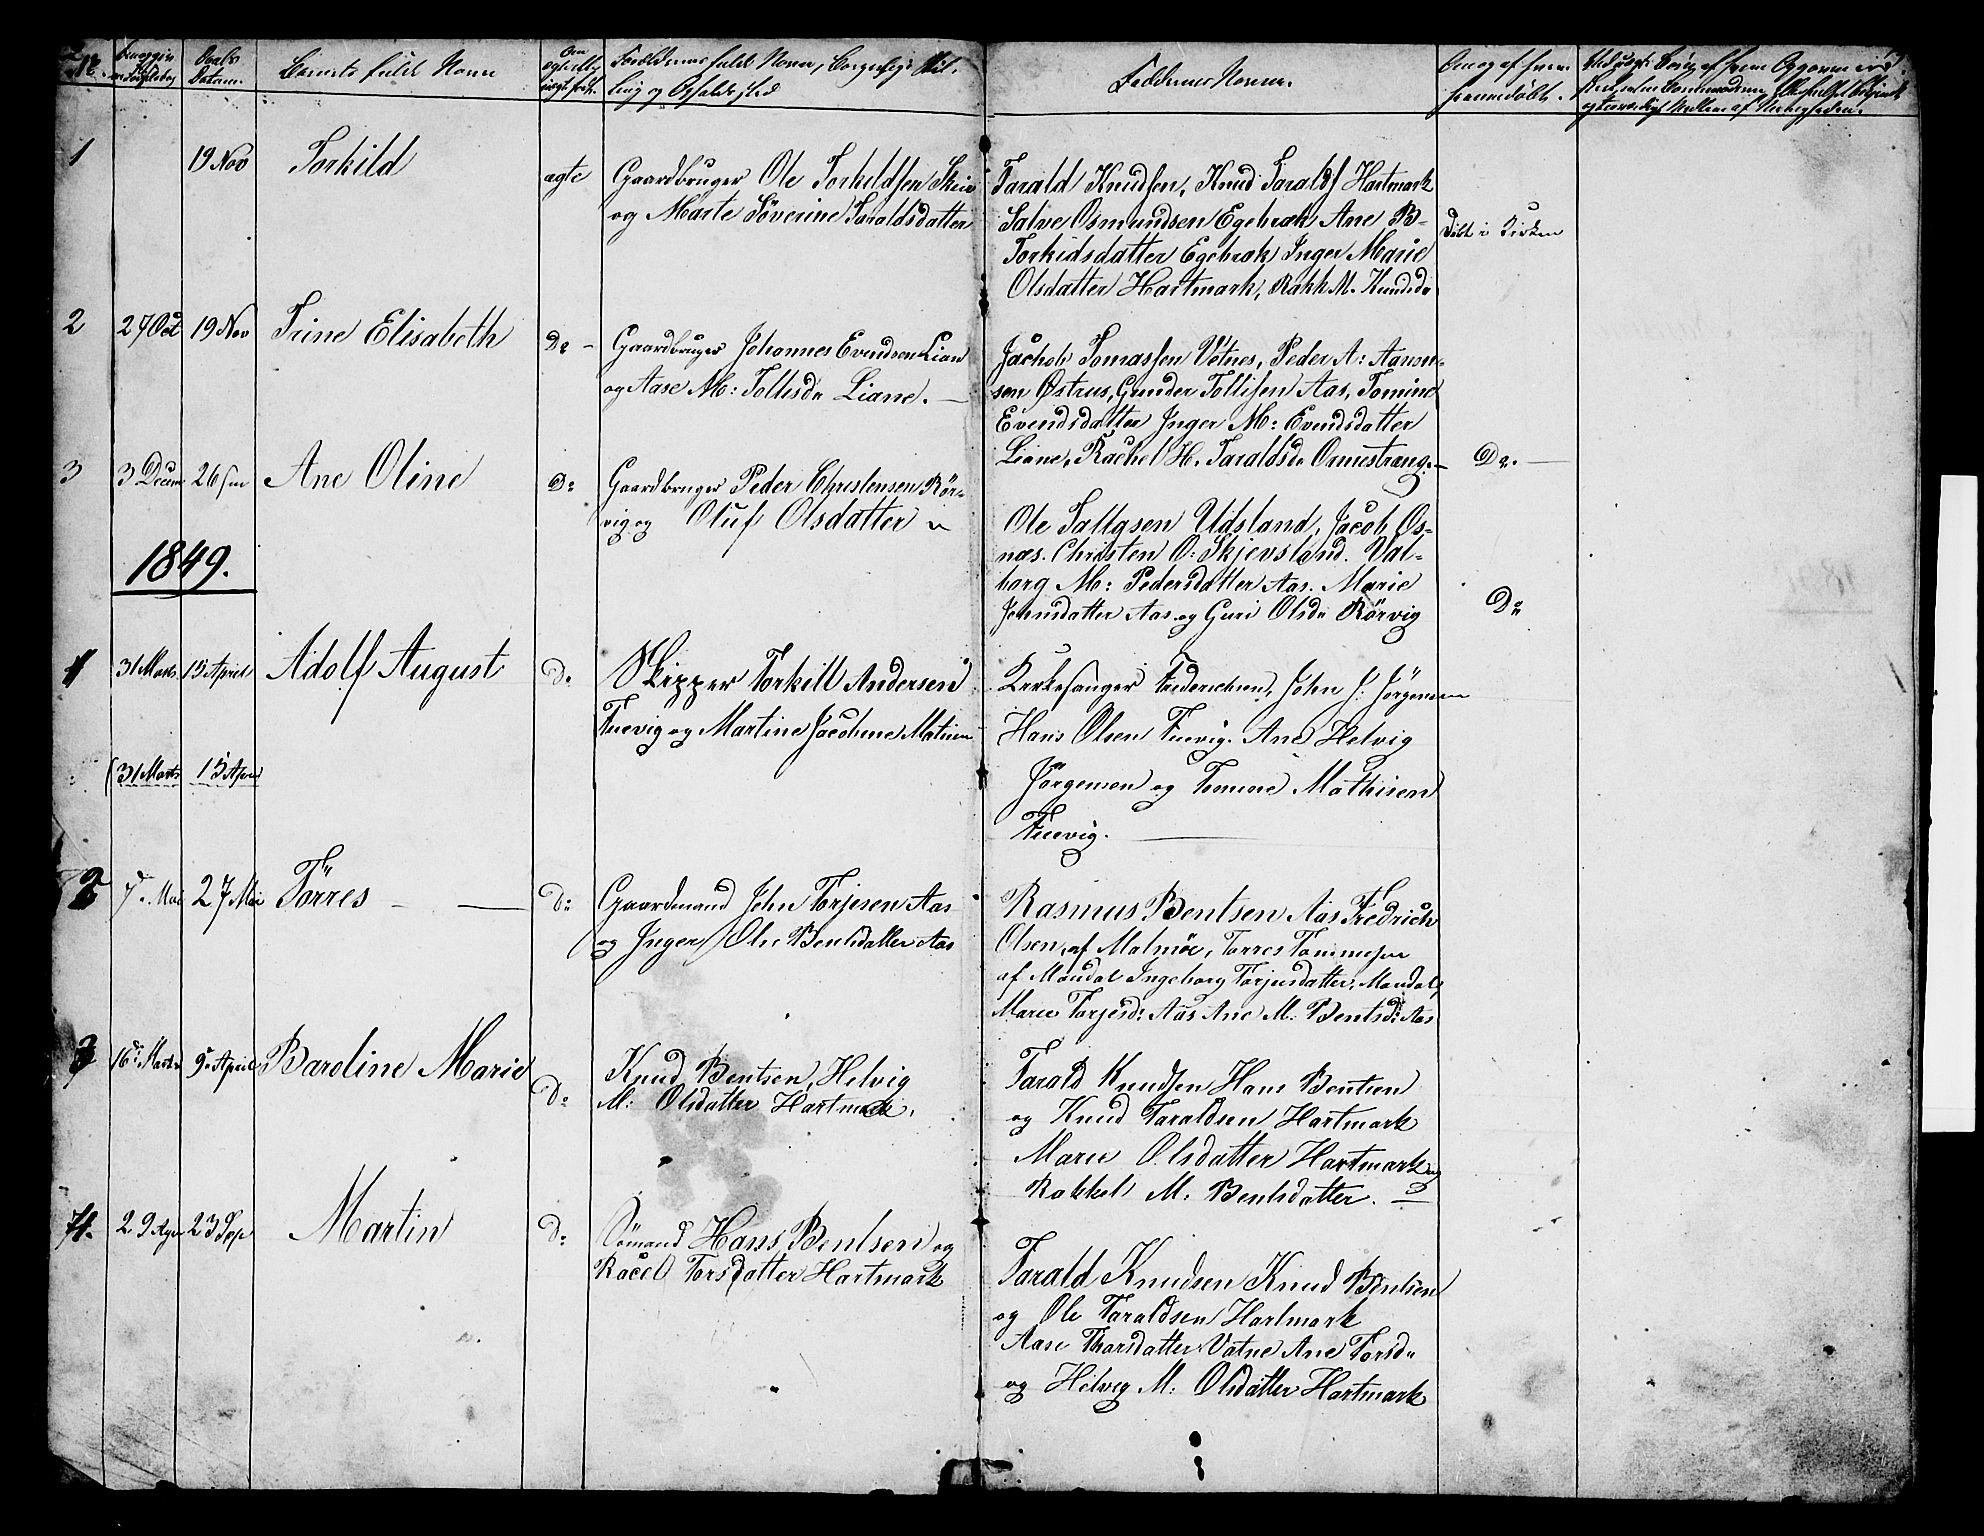 SAK, Mandal sokneprestkontor, F/Fb/Fbb/L0003: Klokkerbok nr. B 3, 1848-1877, s. 2-3